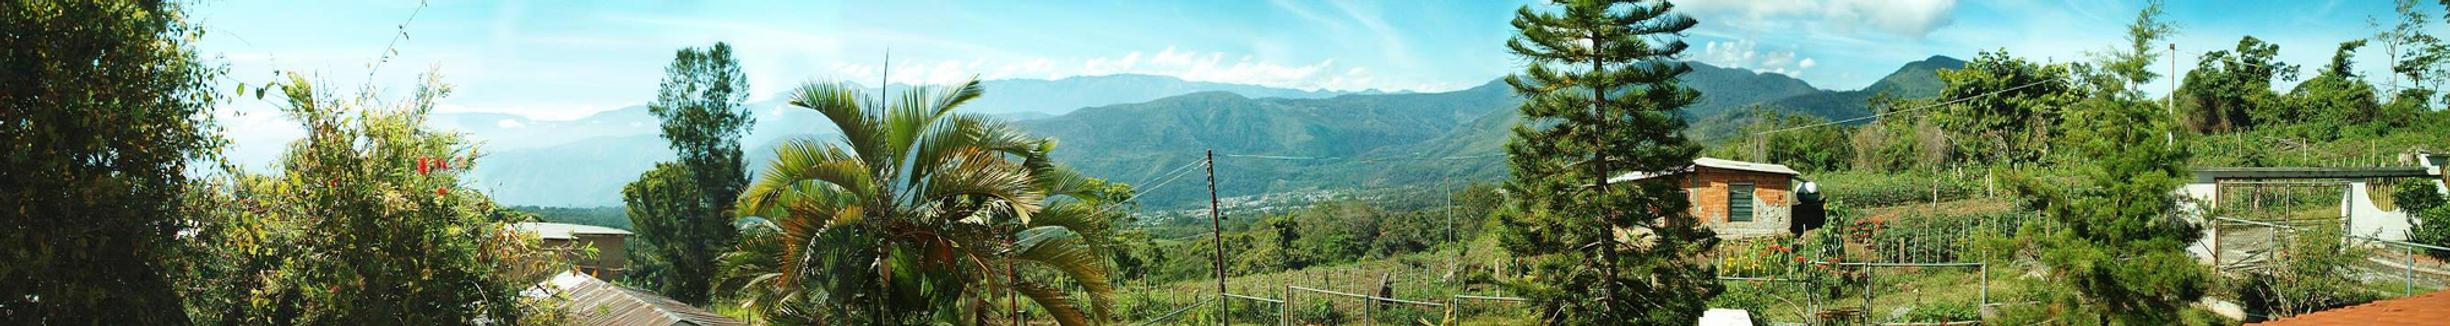 PANORAMICA ANDES VENEZOLANOS by gabi-isea